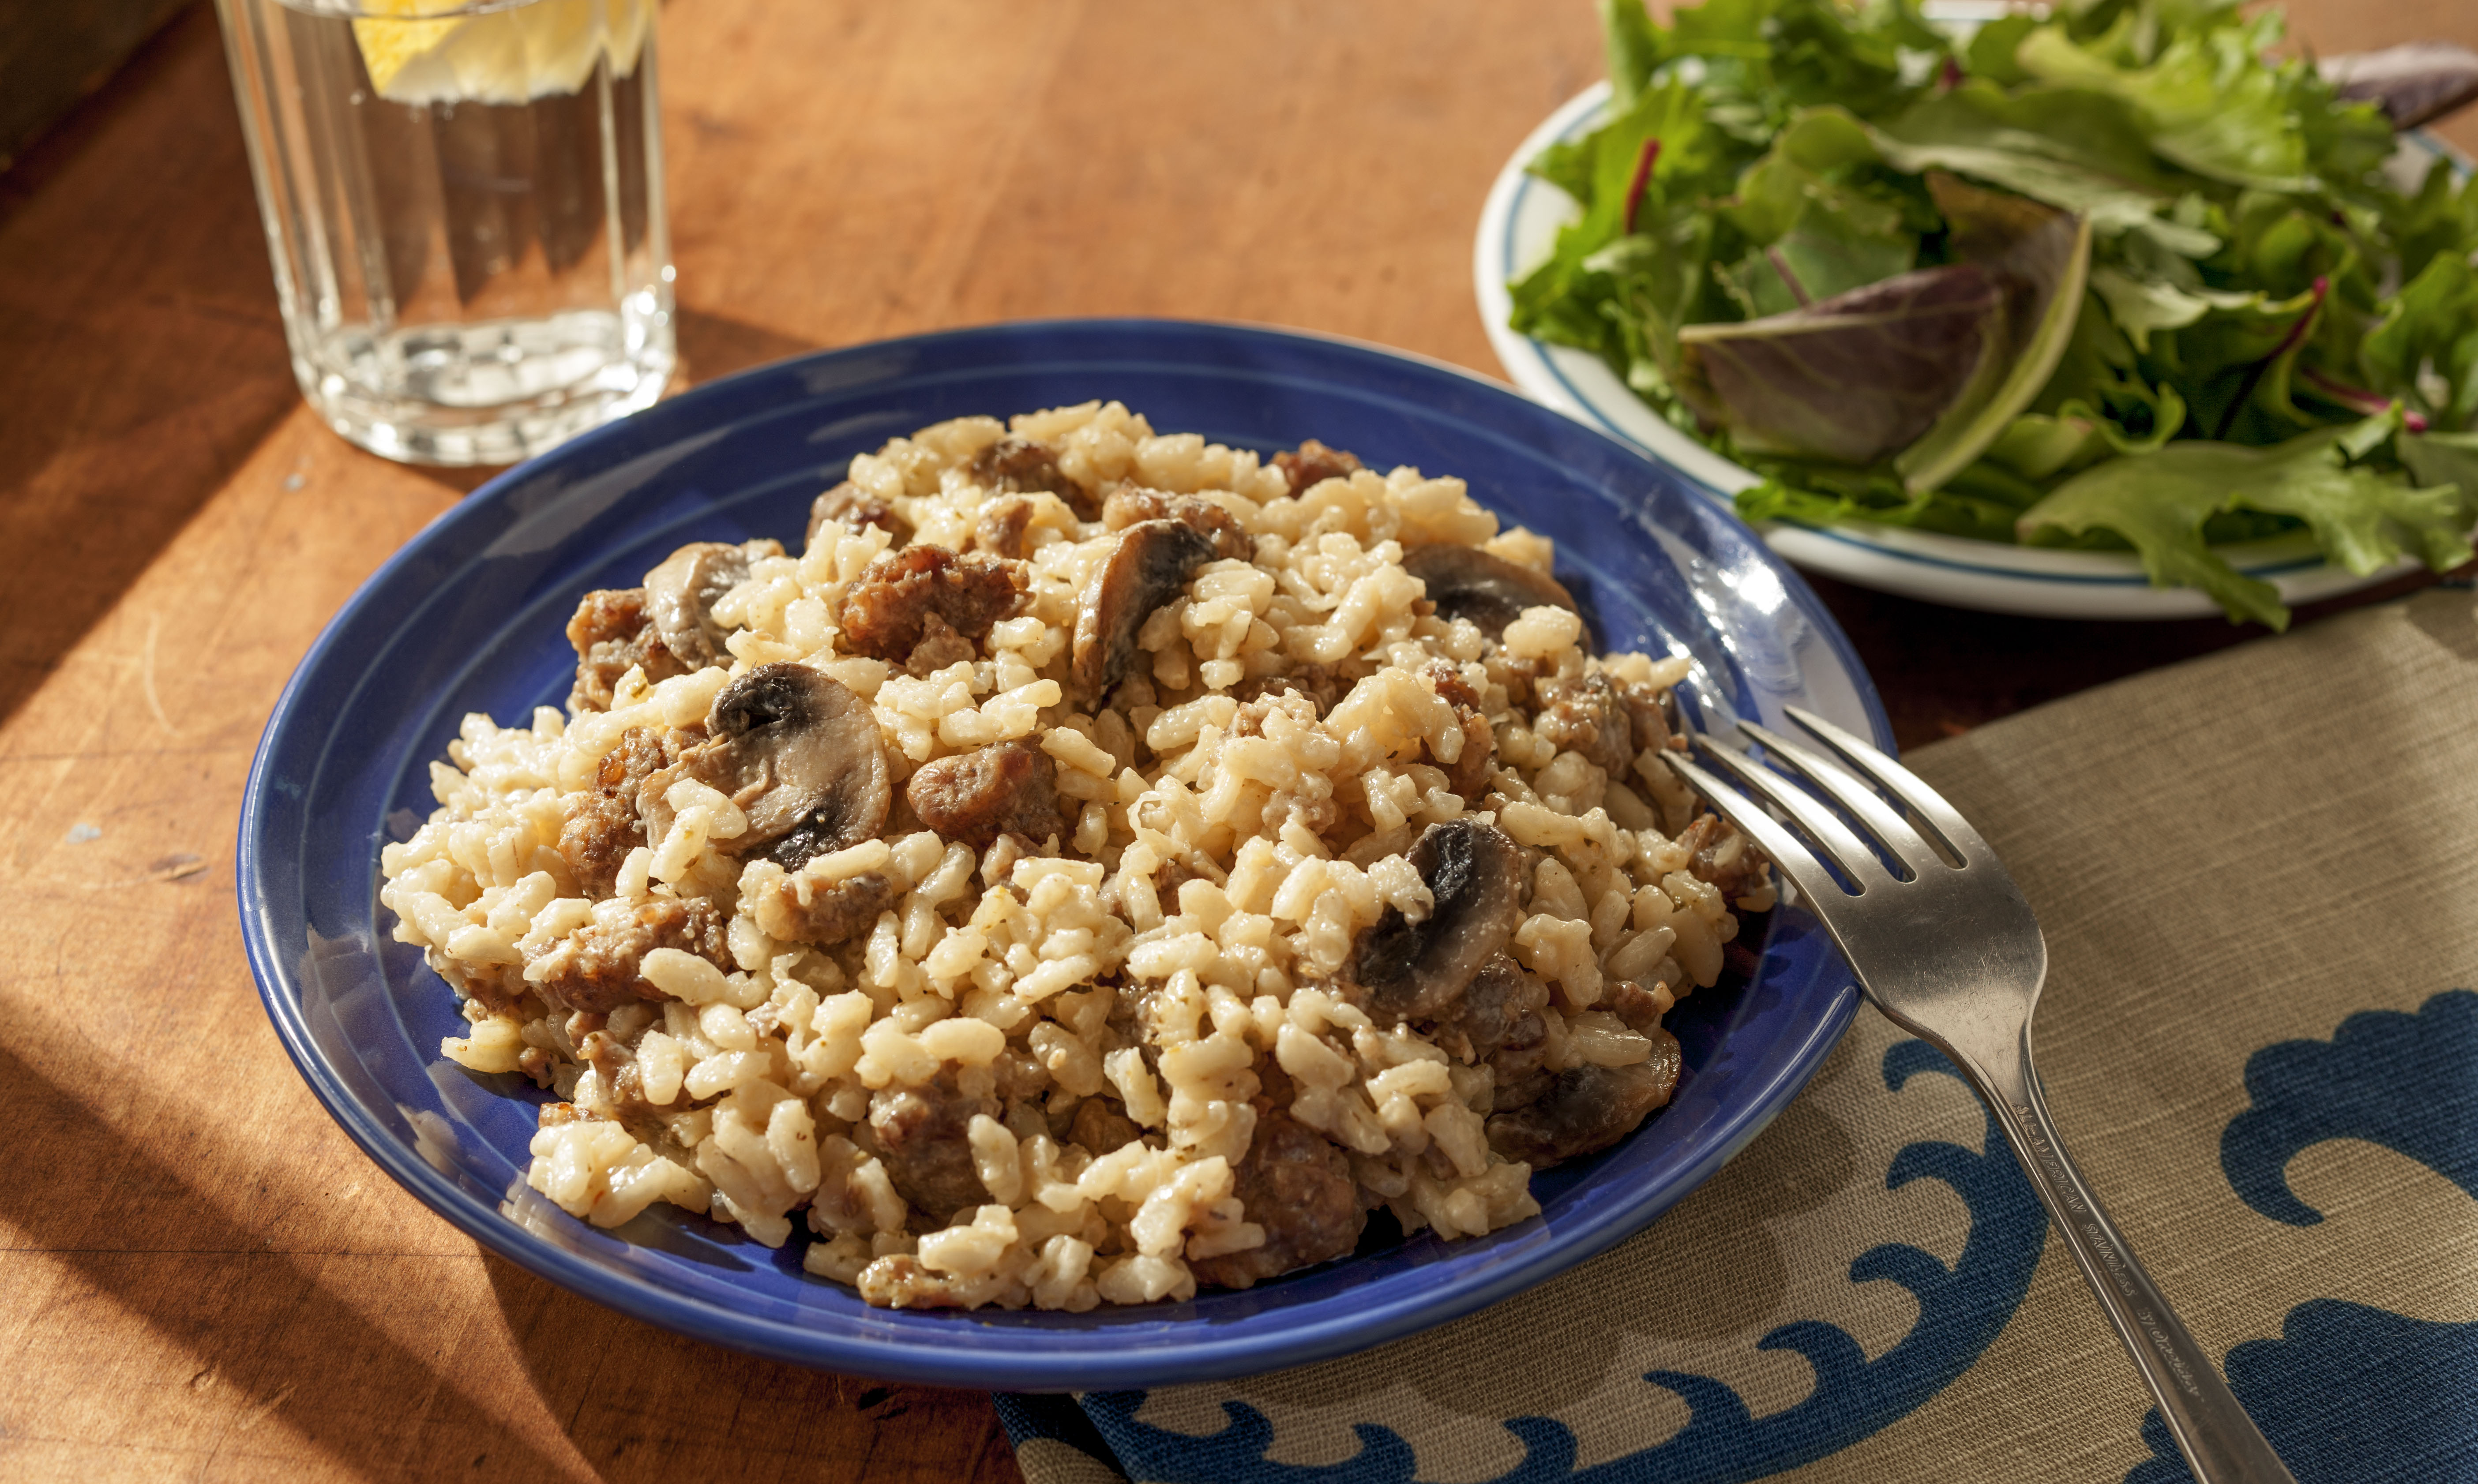 Italian Sausage and Mushroom Risotto